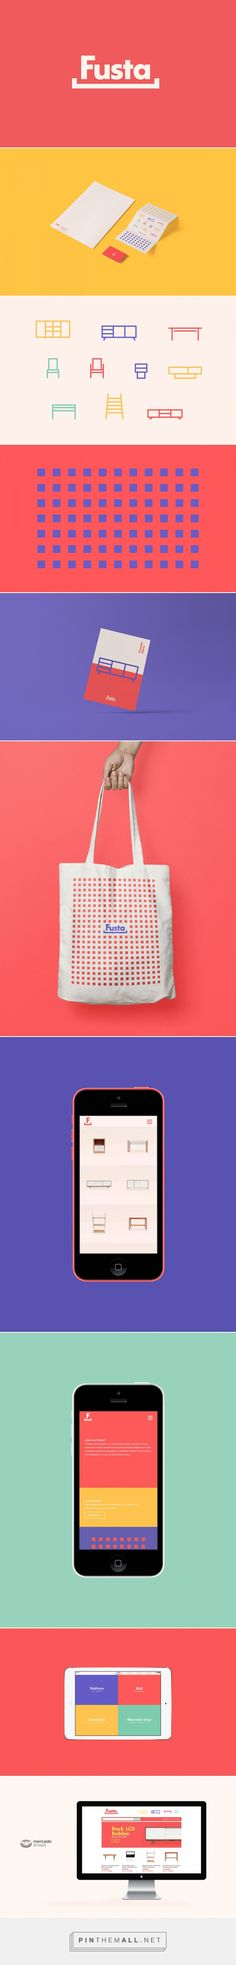 Fusta. on Behance (Furniture Designs Logo)